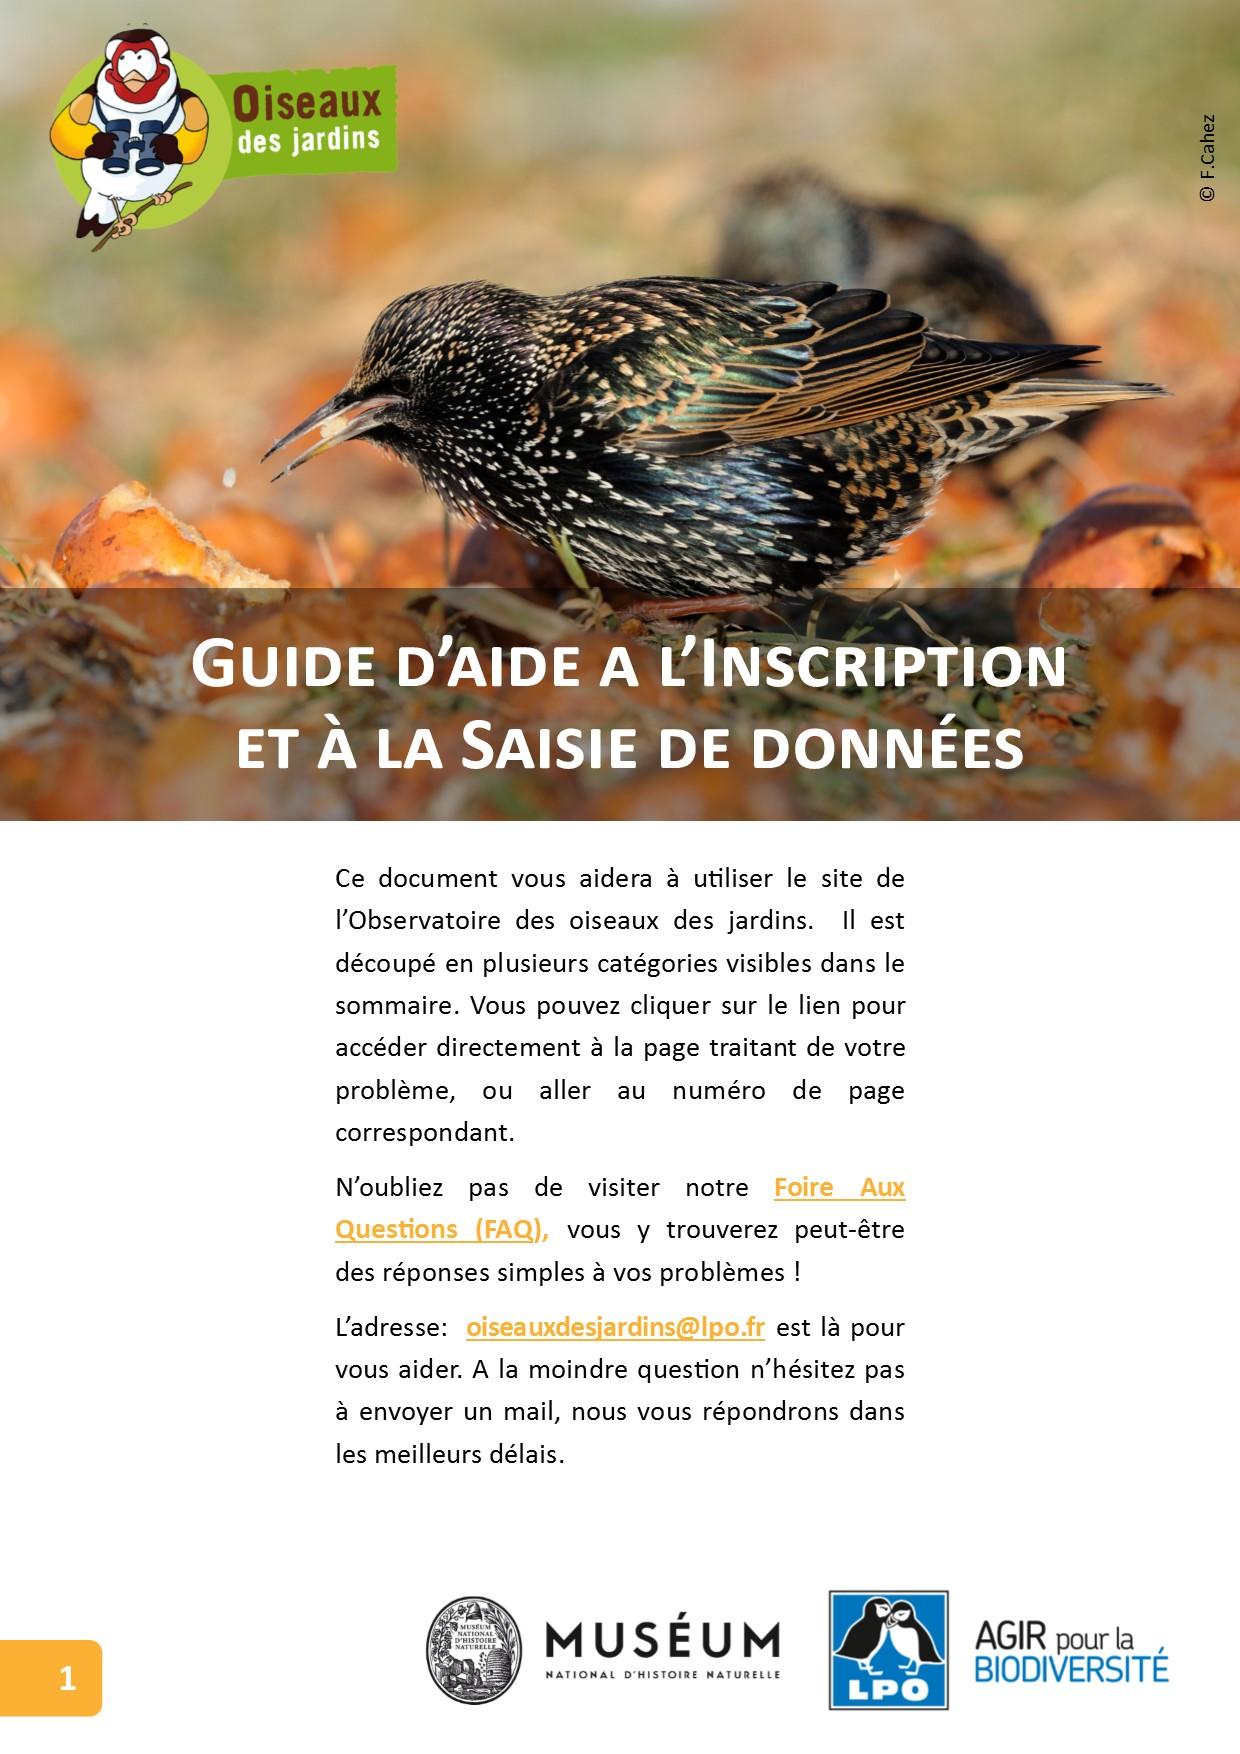 https://cdnfiles2.biolovision.net/www.faune-anjou.org/userfiles/divers/Guideaideparticipation.jpg